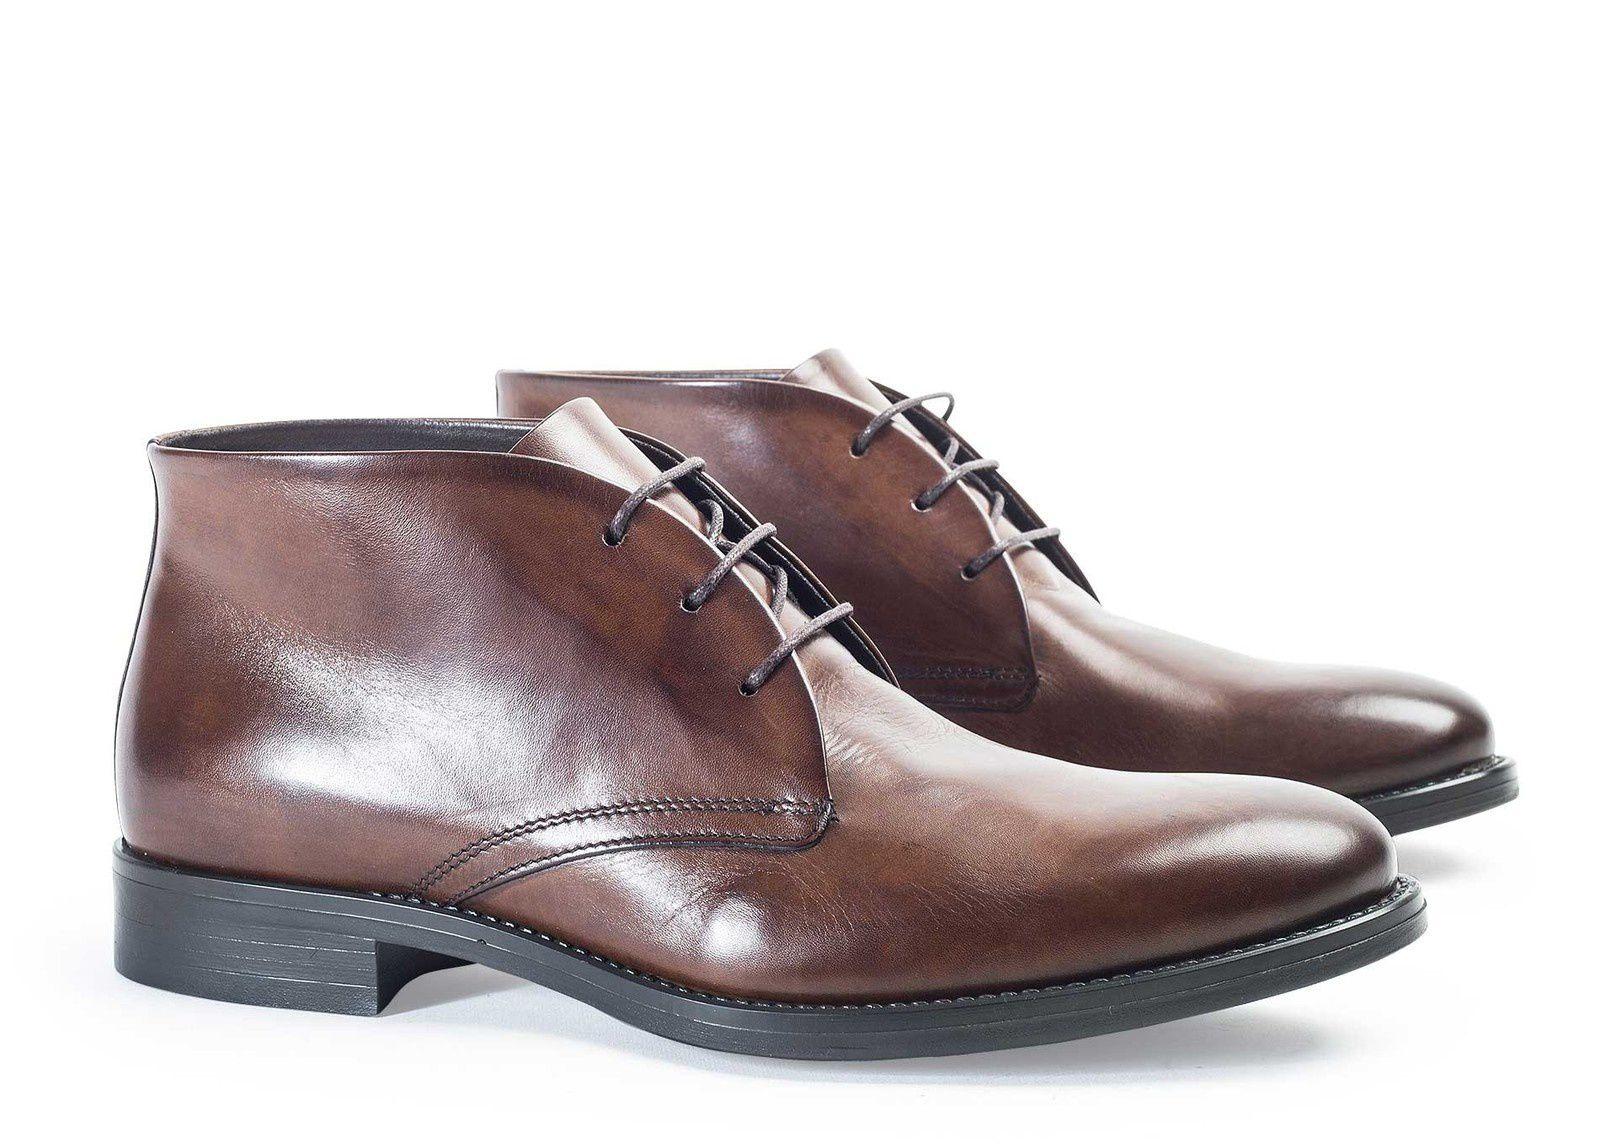 117d7b6a84d71a Chaussures homme André - sarlmgntp.overblog.com